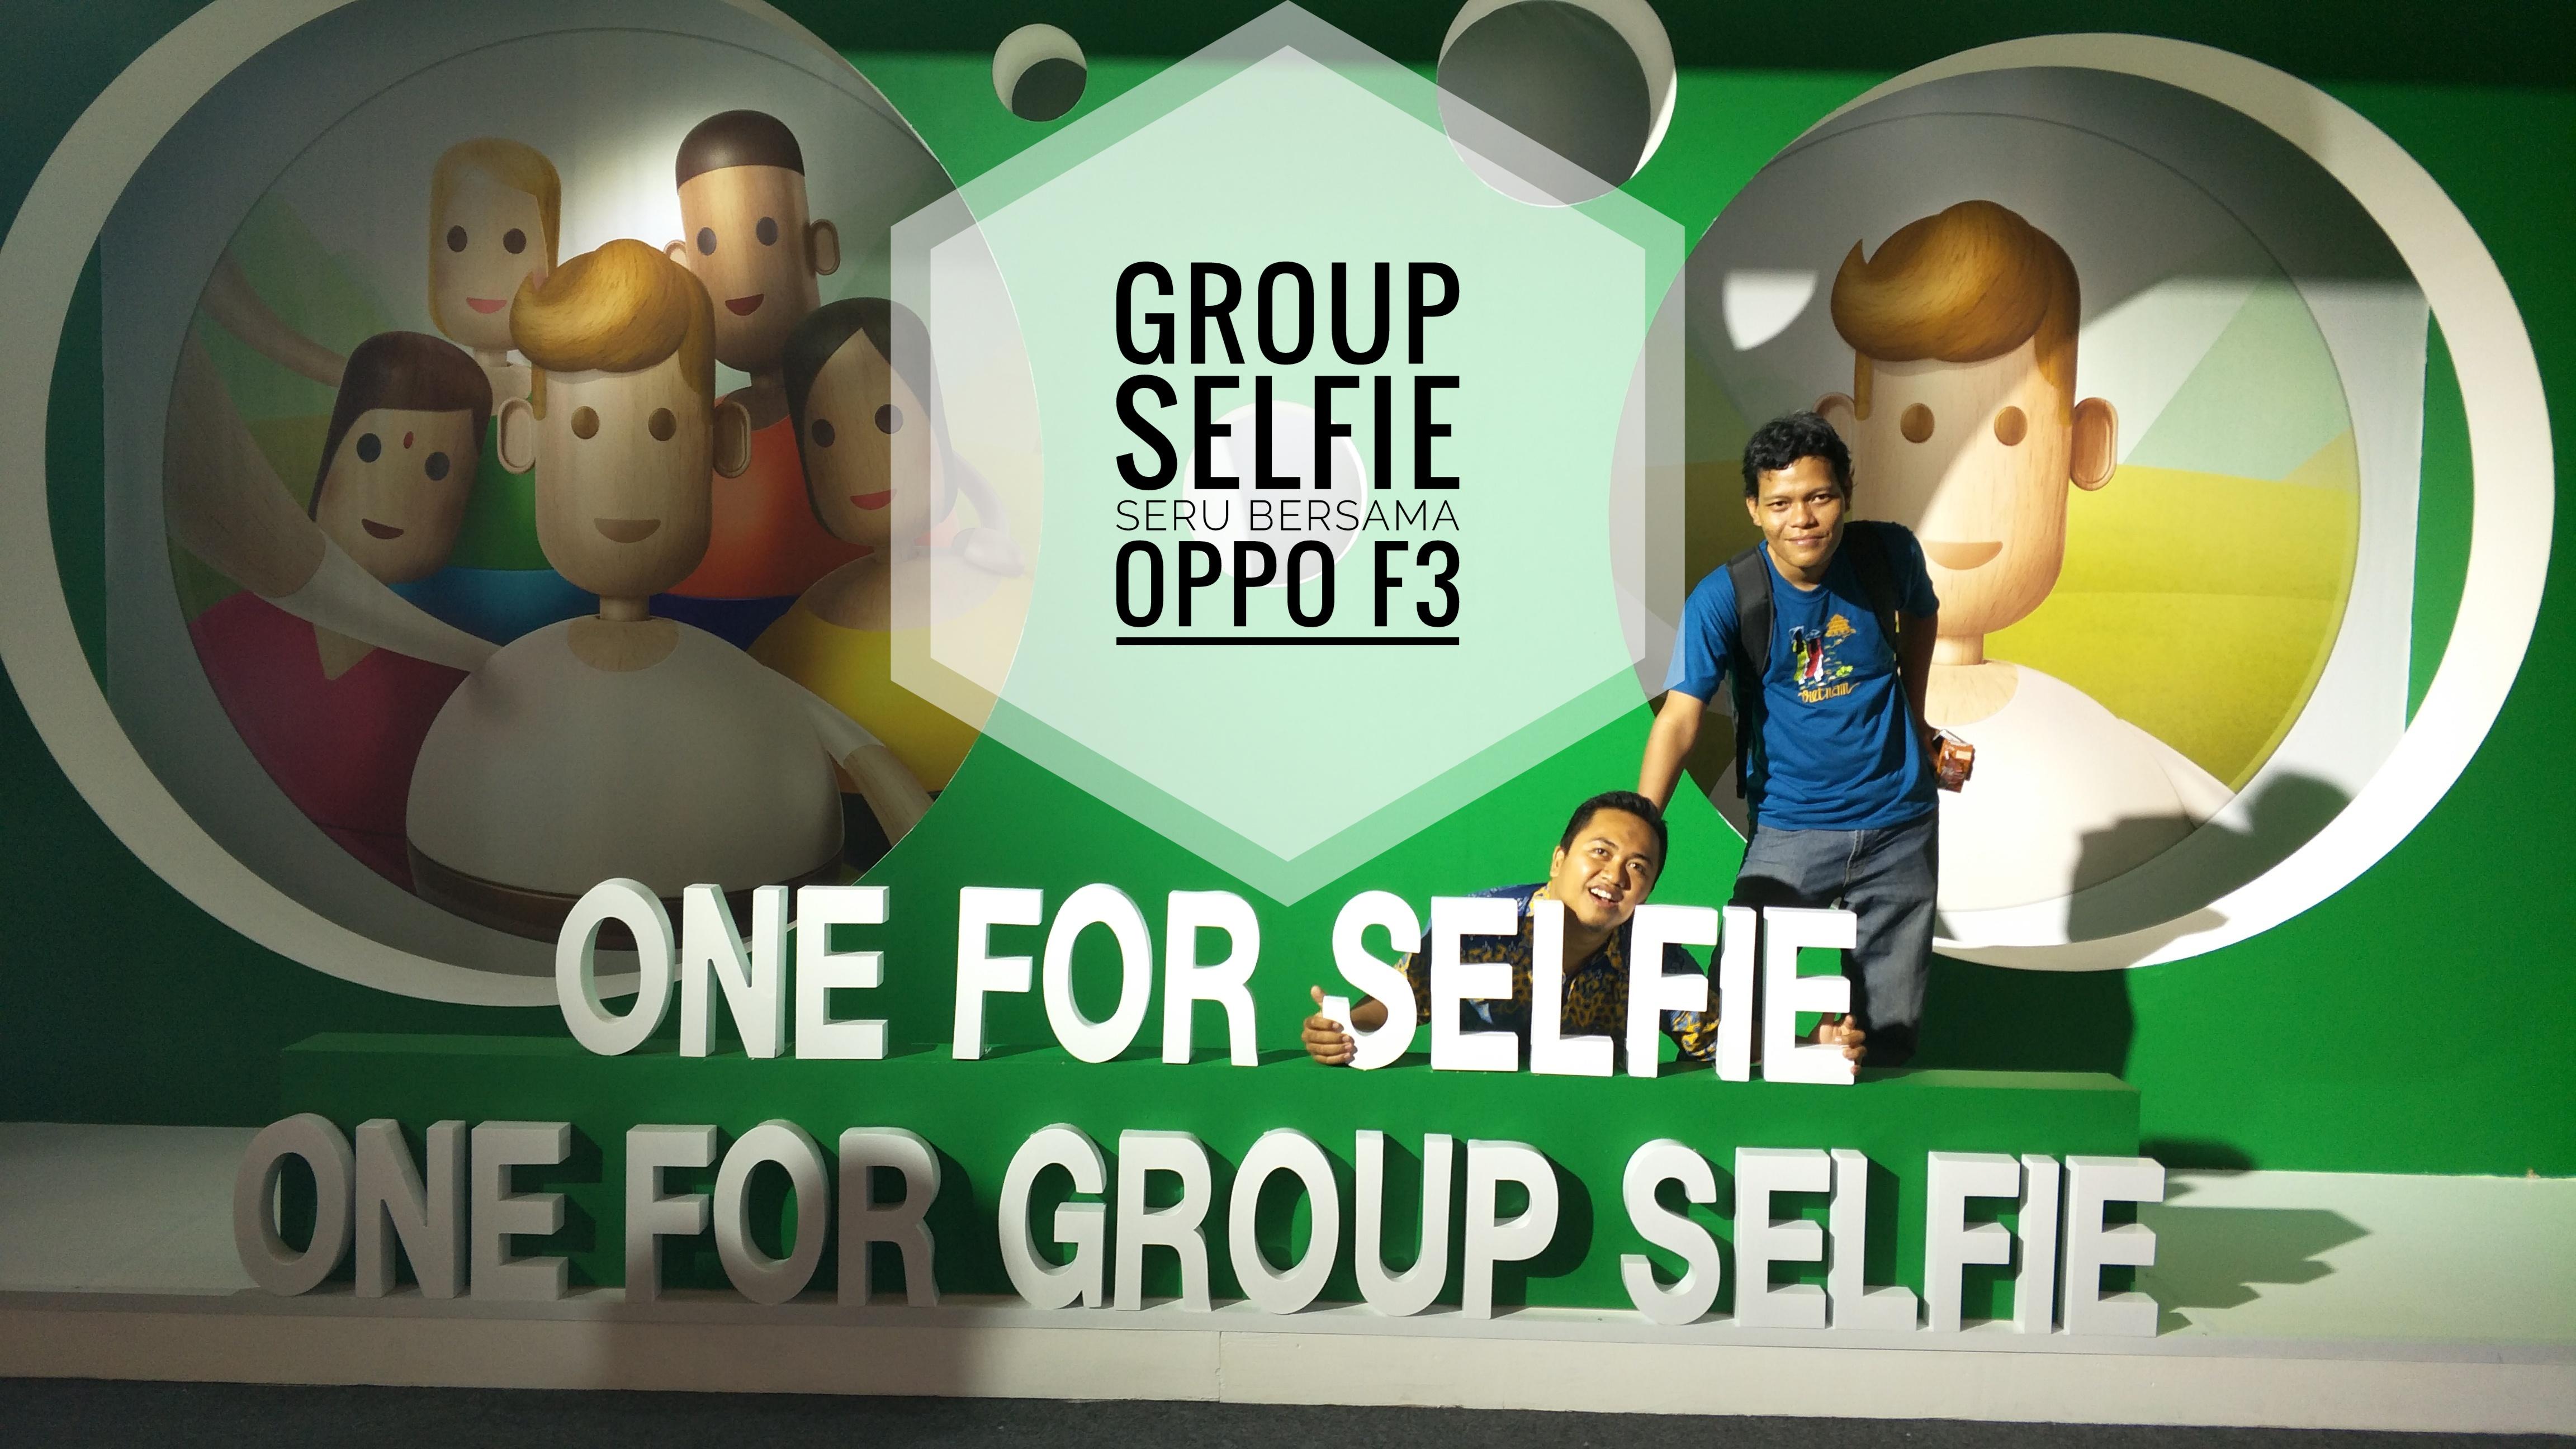 Group Selfie Seru bersama OPPO F3